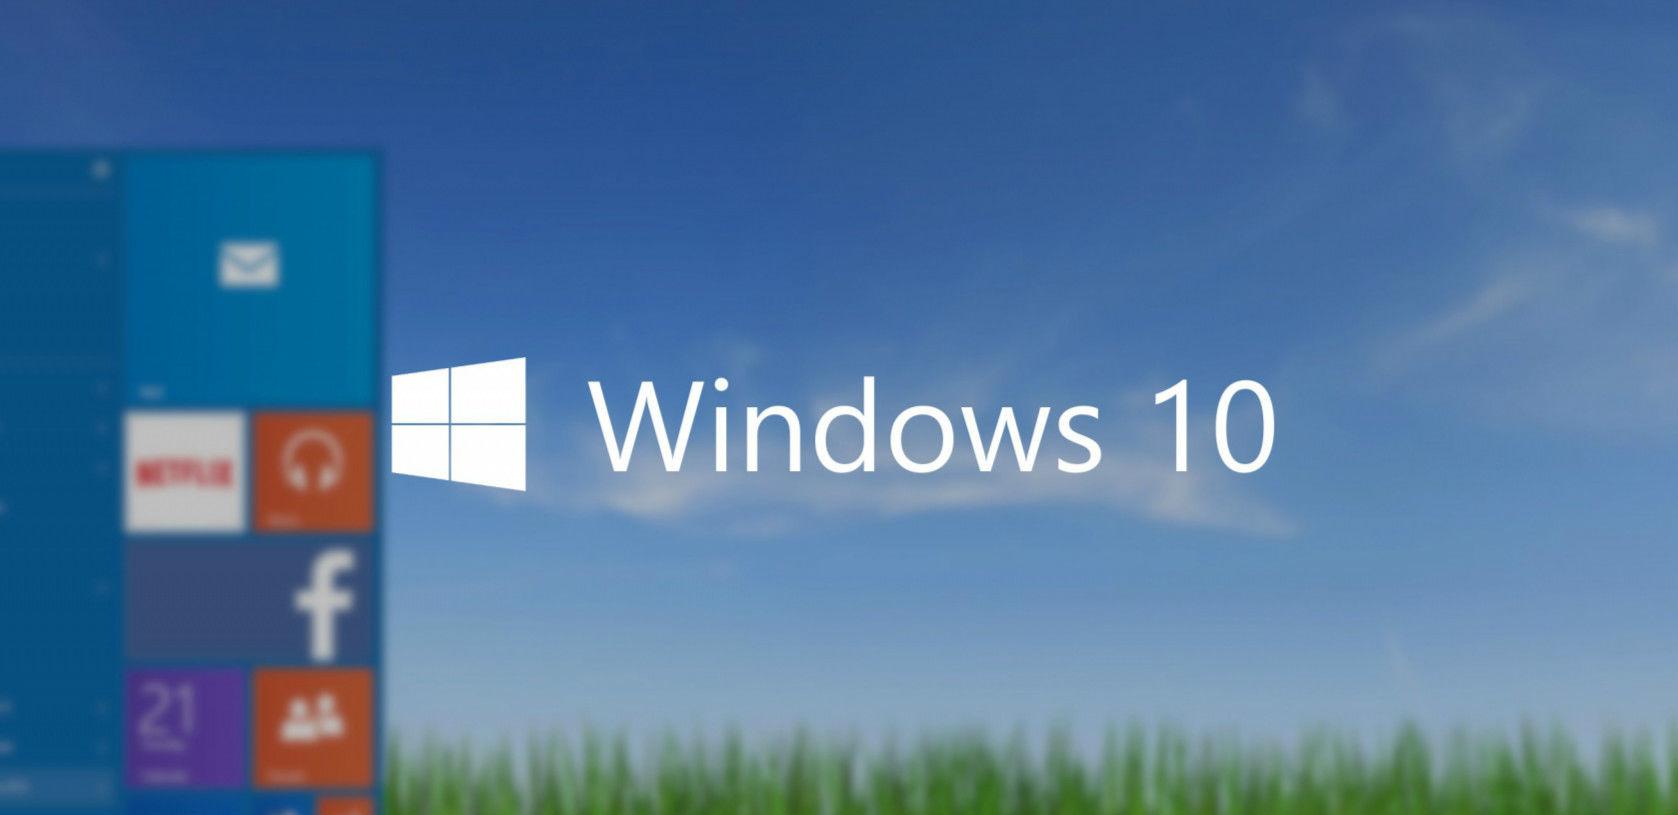 Windows 10如期而至,但它真的值得升级吗?